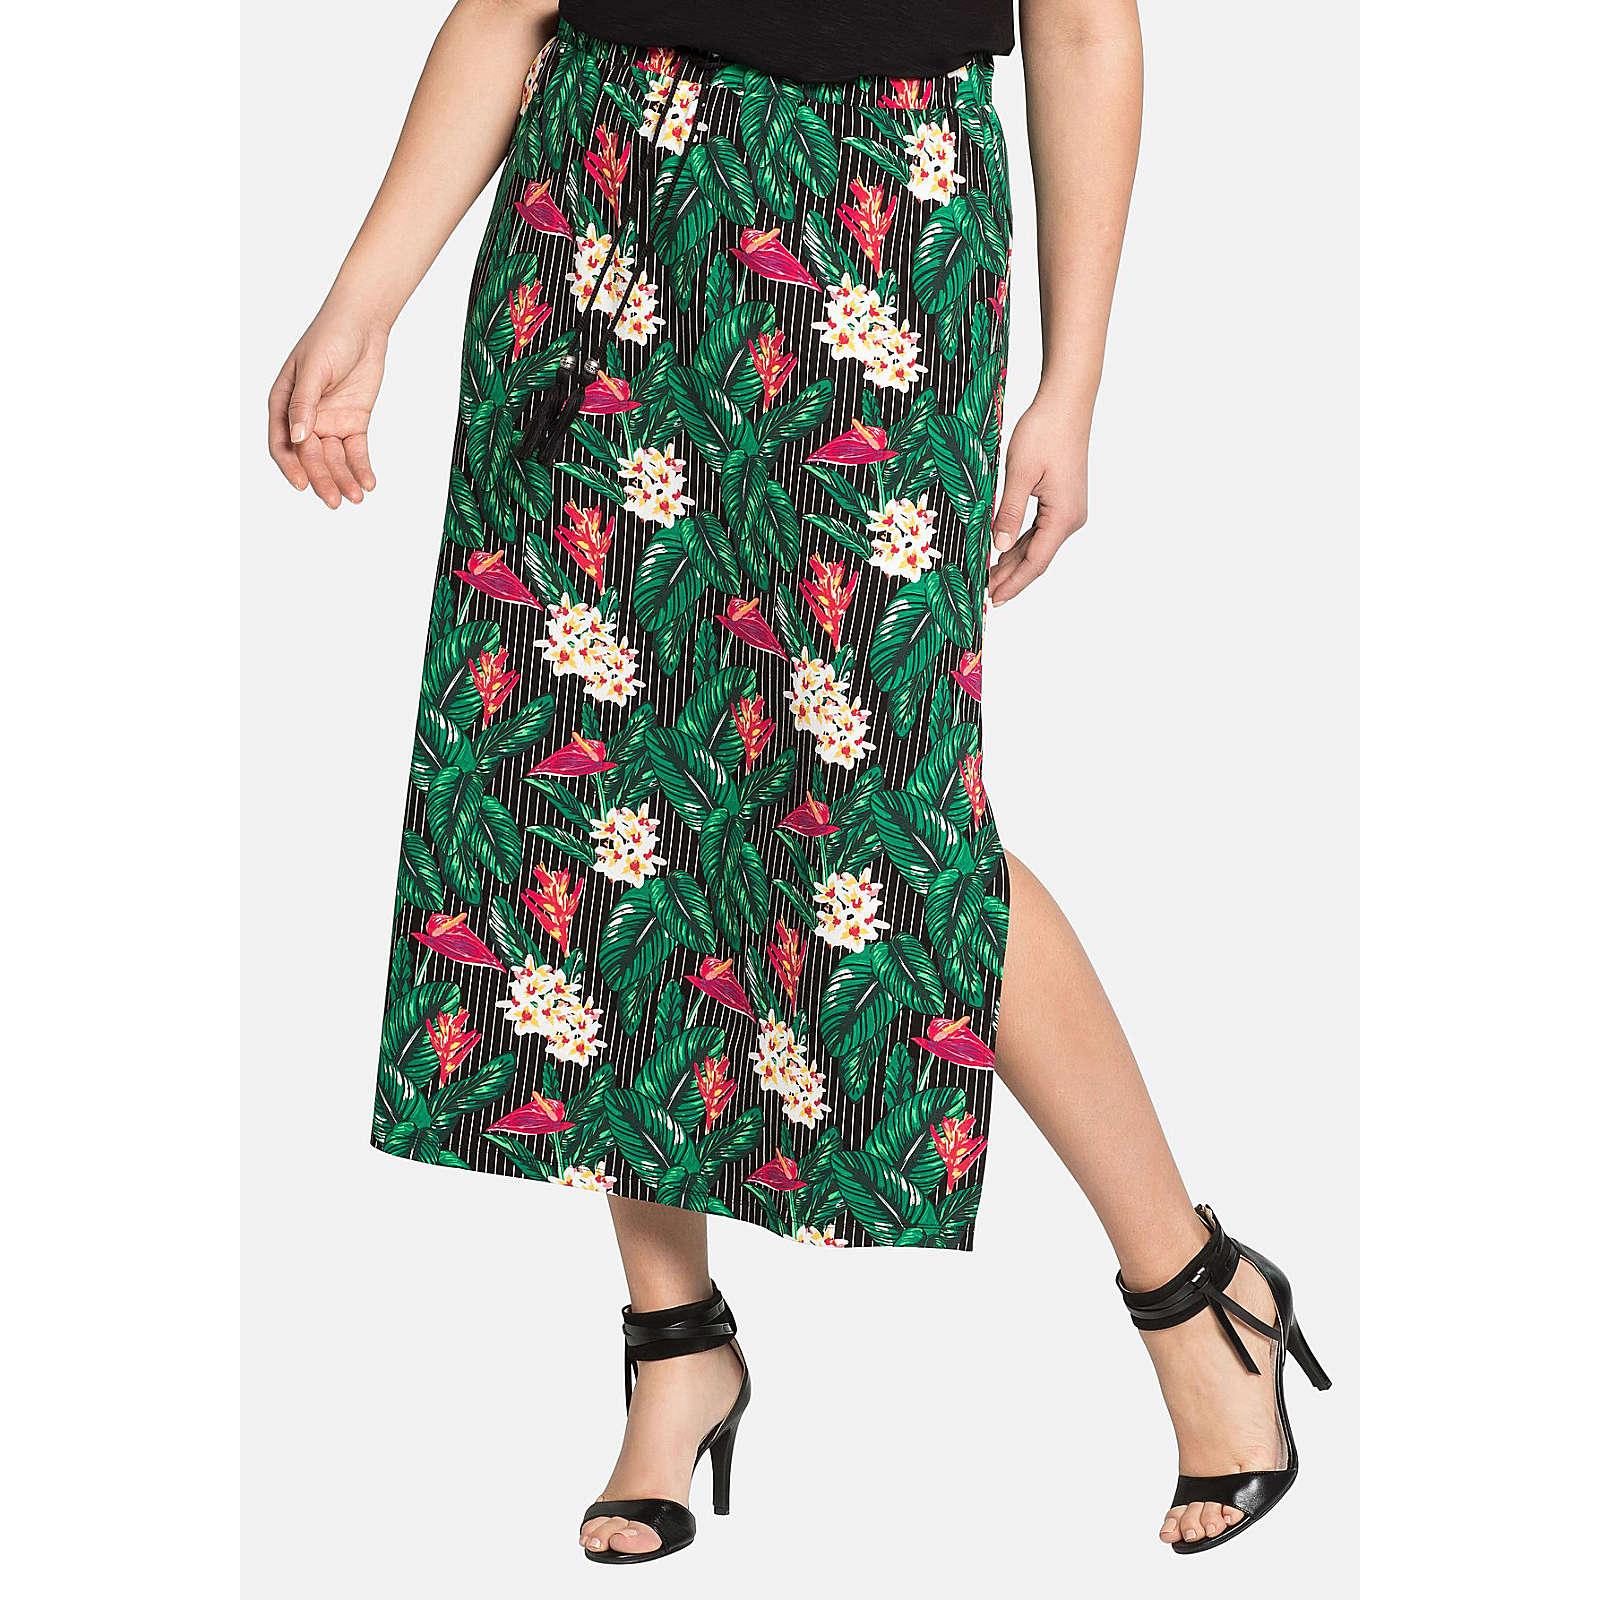 sheego Maxirock mit floralem Muster Röcke mehrfarbig Damen Gr. 56